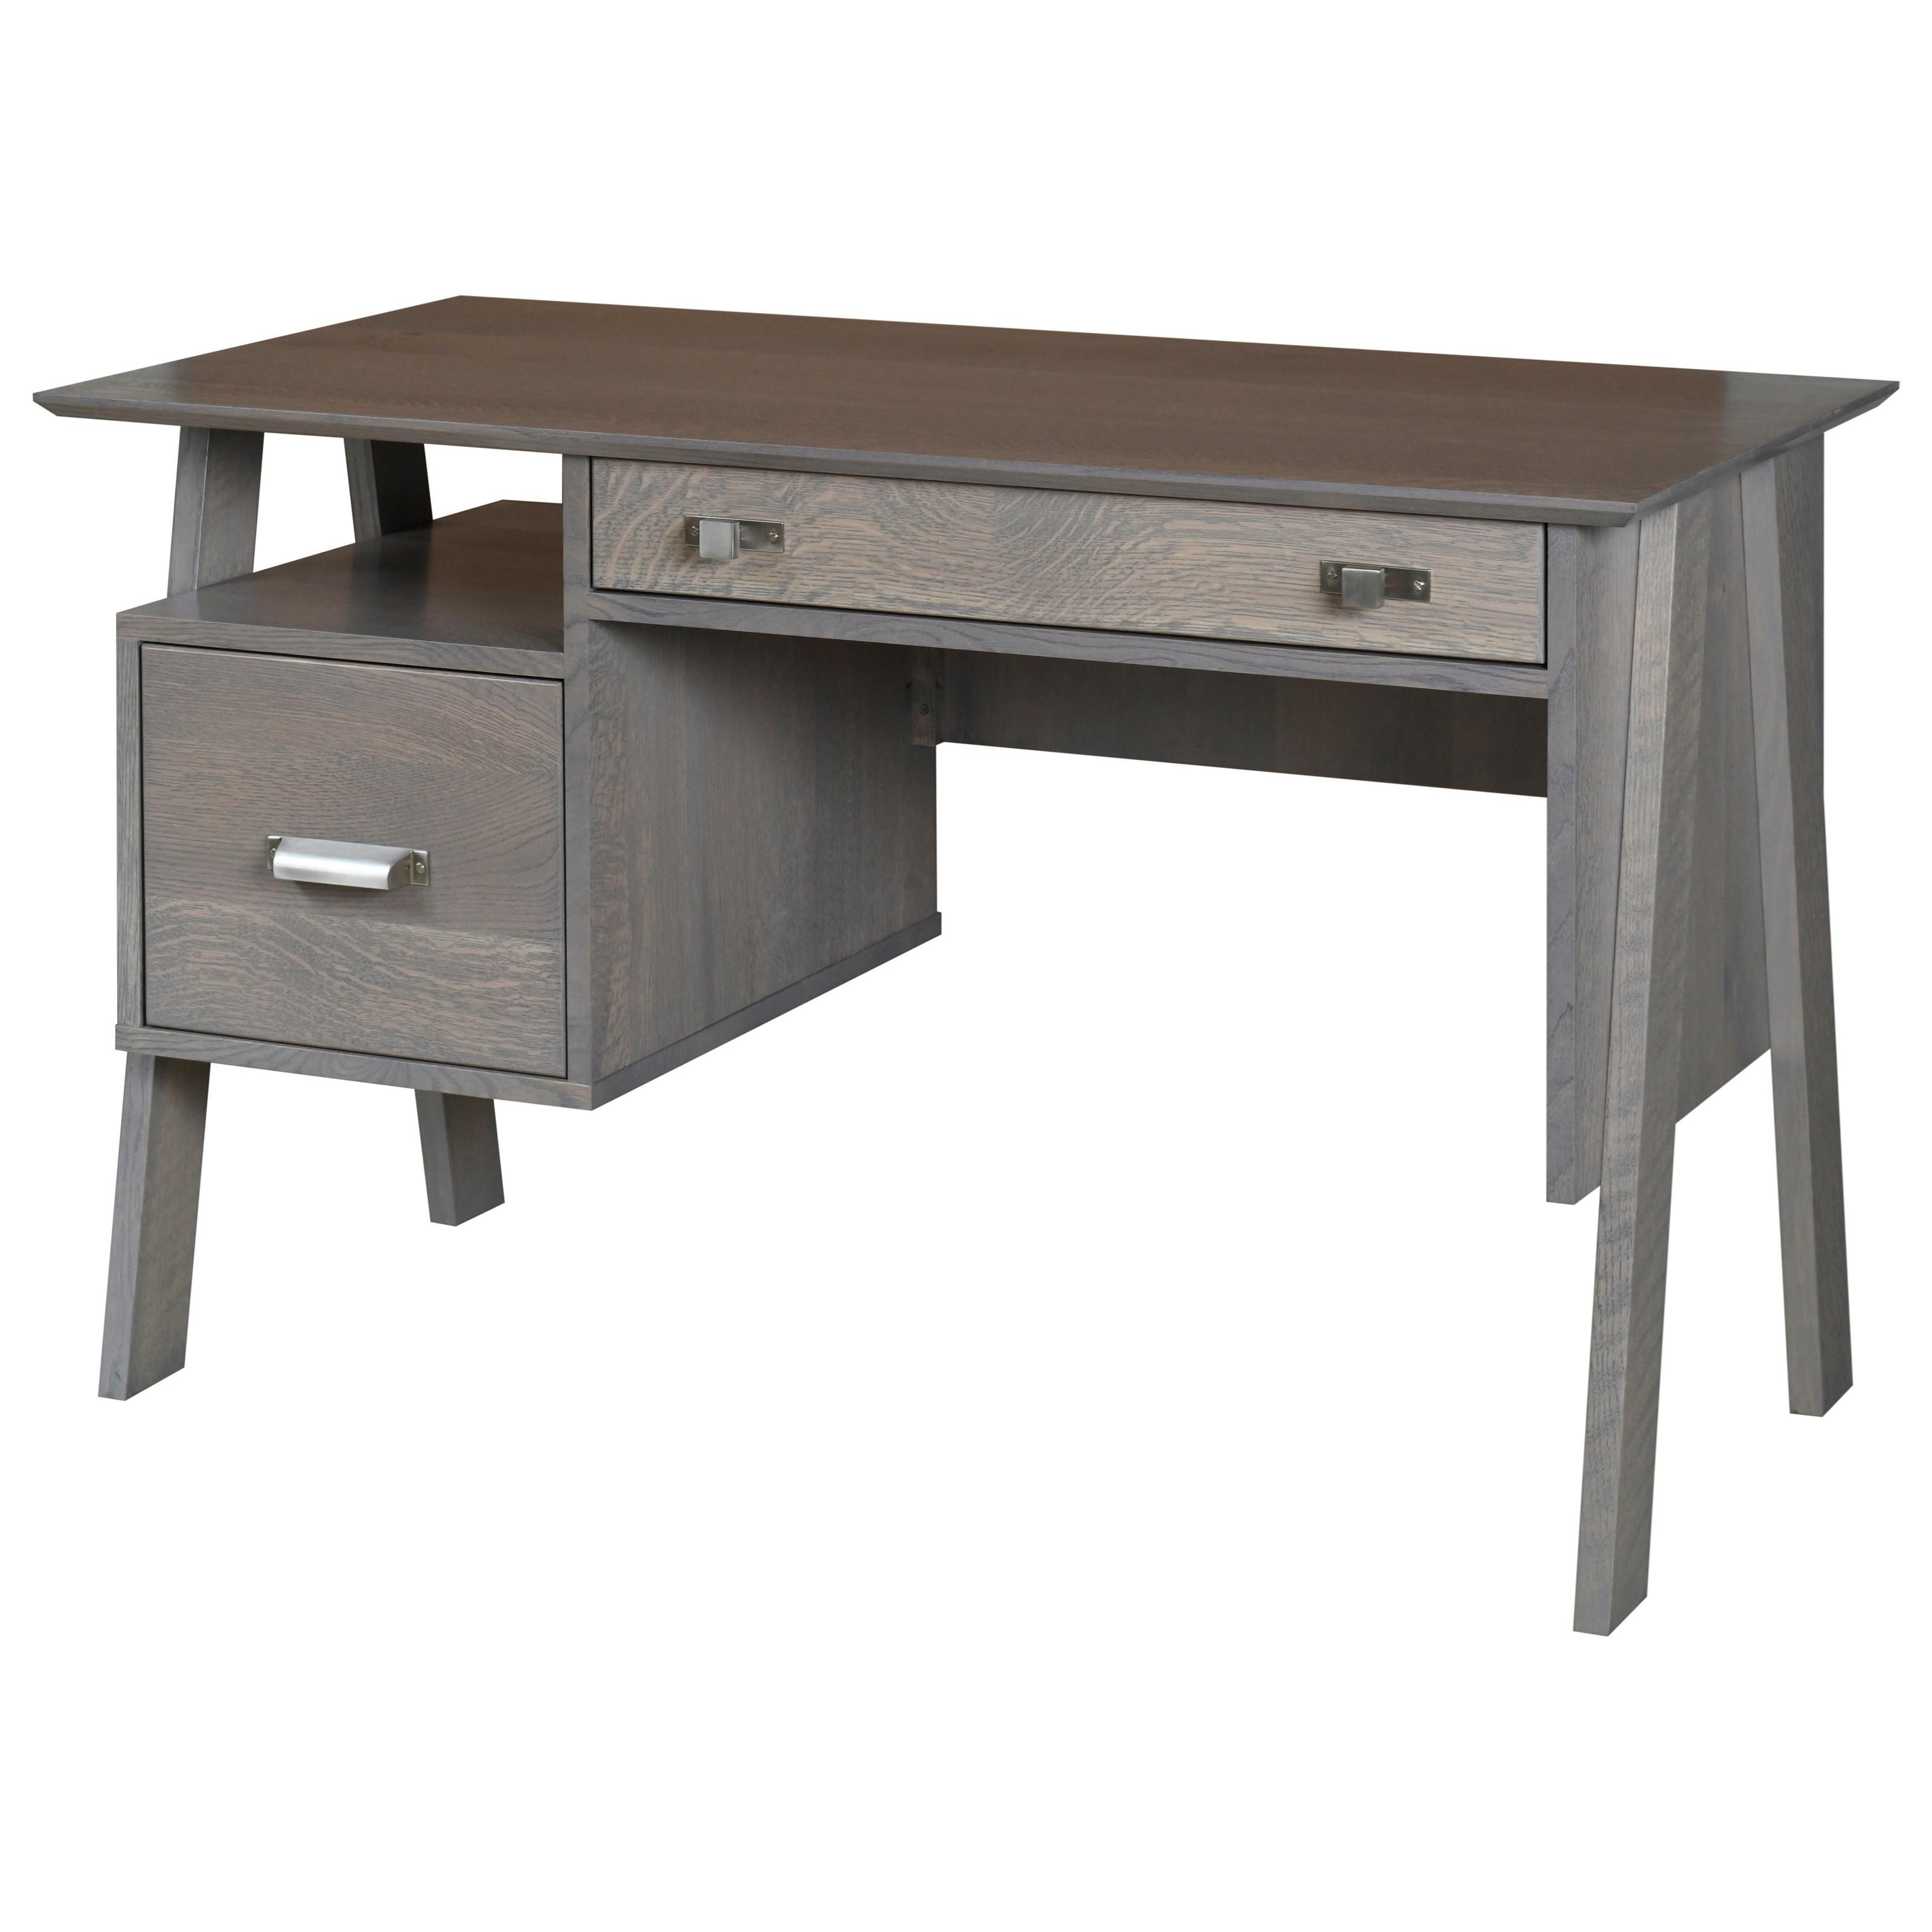 1700 Series Desks Denali Writing Desk by Y & T Woodcraft at Saugerties Furniture Mart